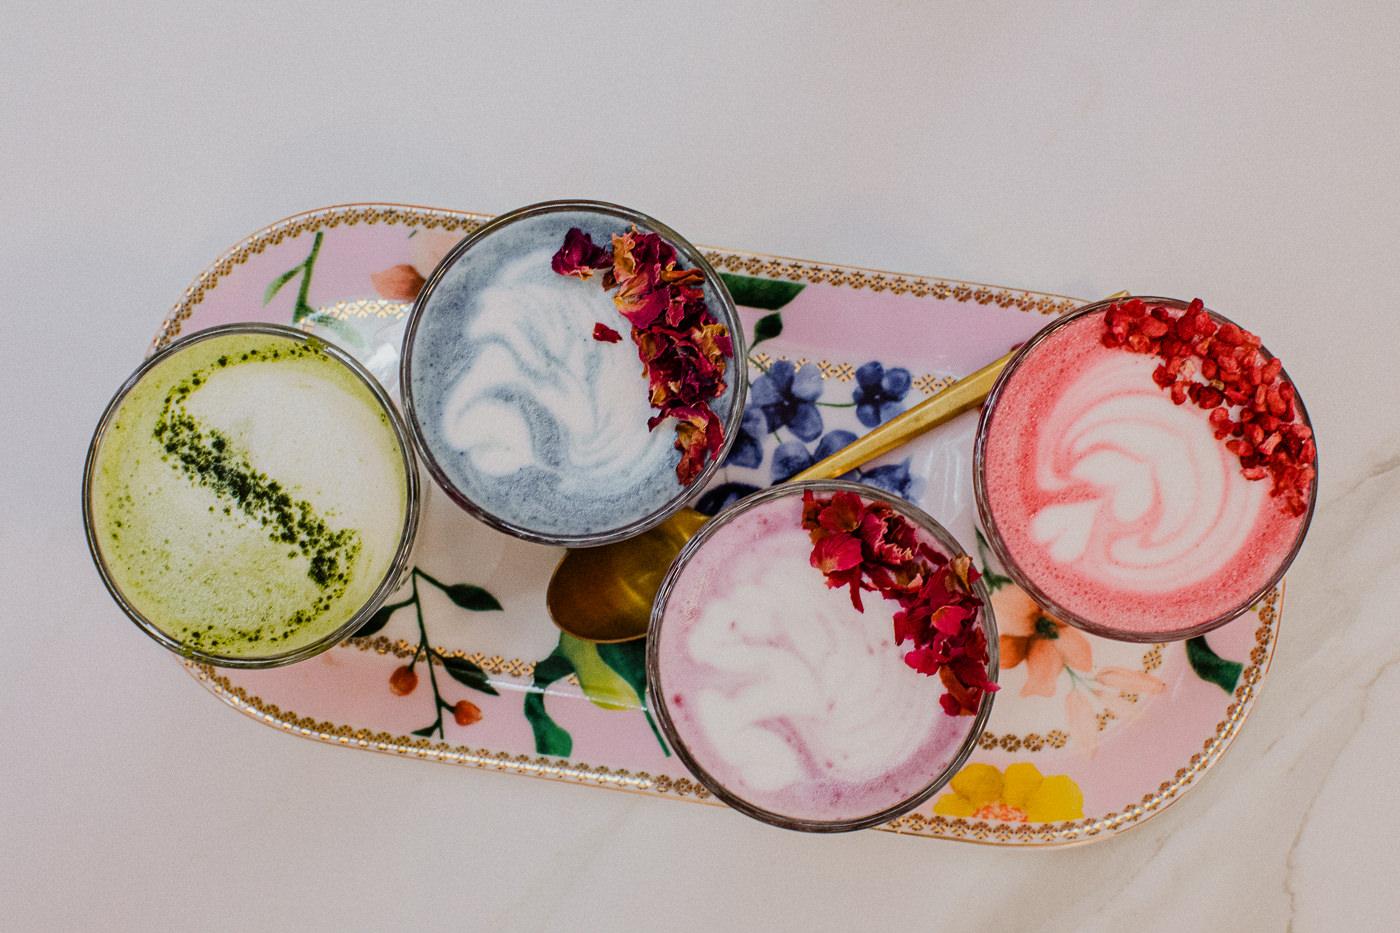 wellness latte - liquid breakfast - instagrammable cafe in Melbourne